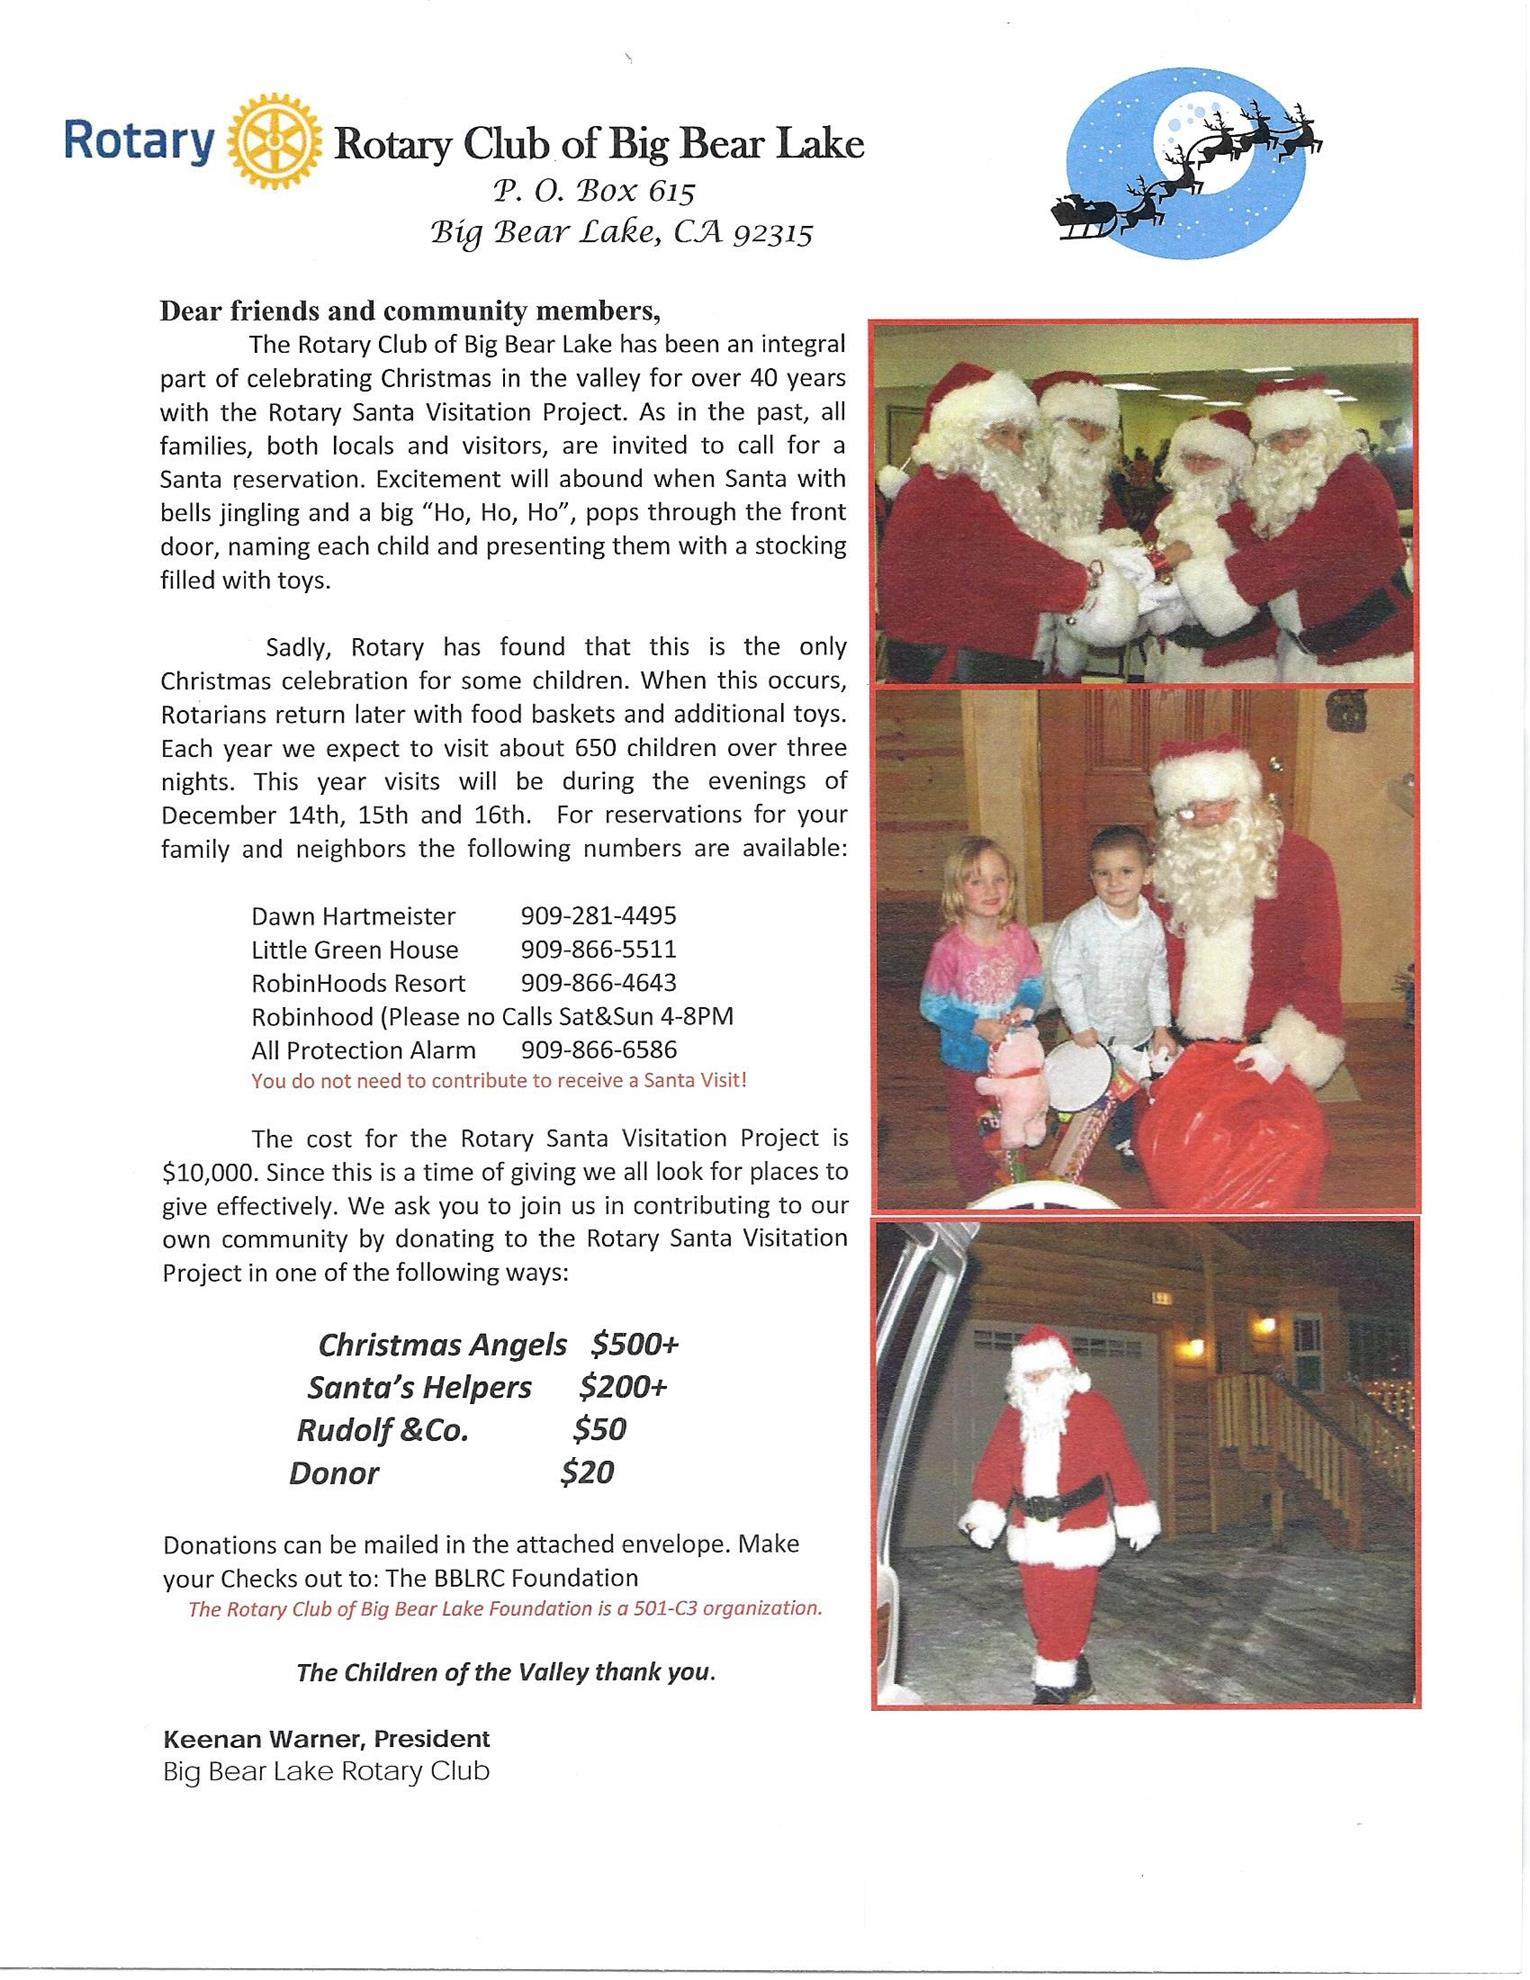 Thanksgiving and Christmas   Rotary Club of Big Bear Lake